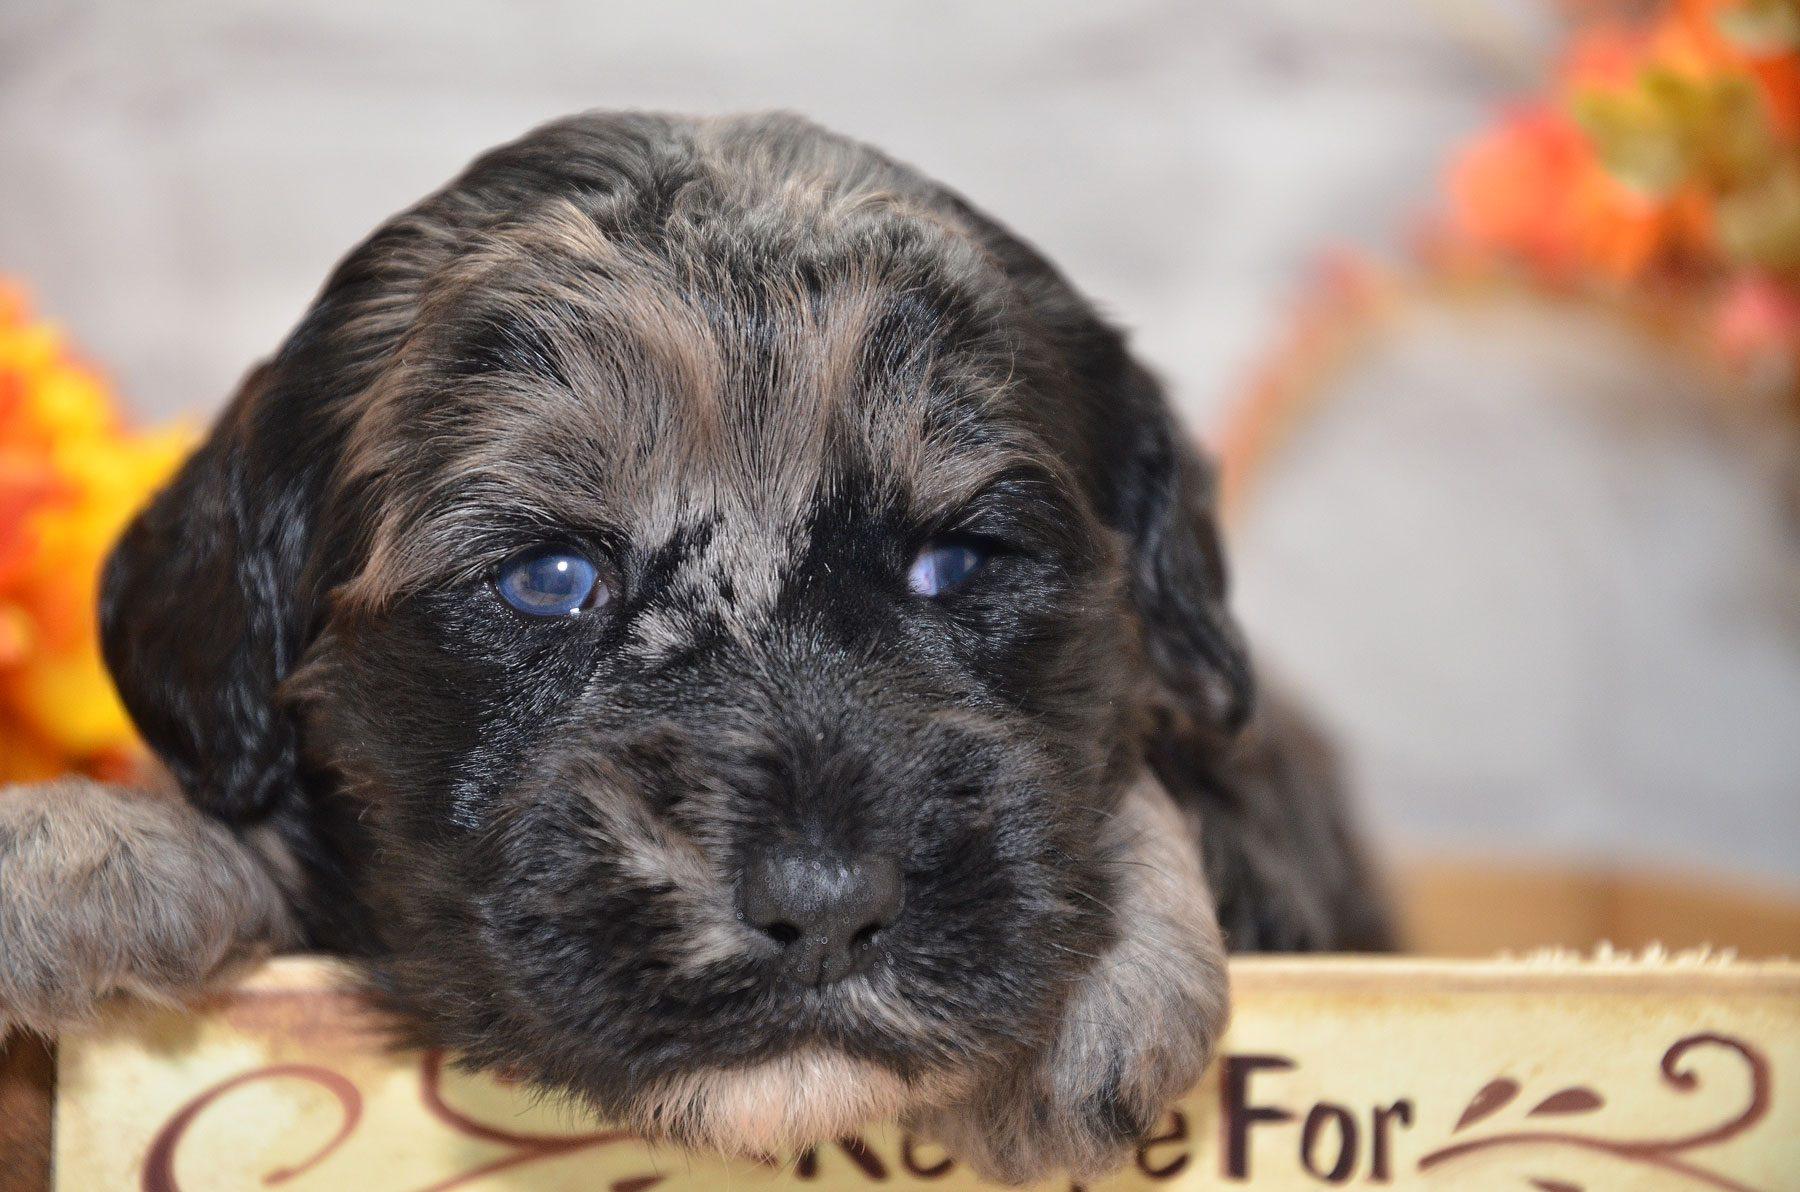 puppies-9-28-20_6715